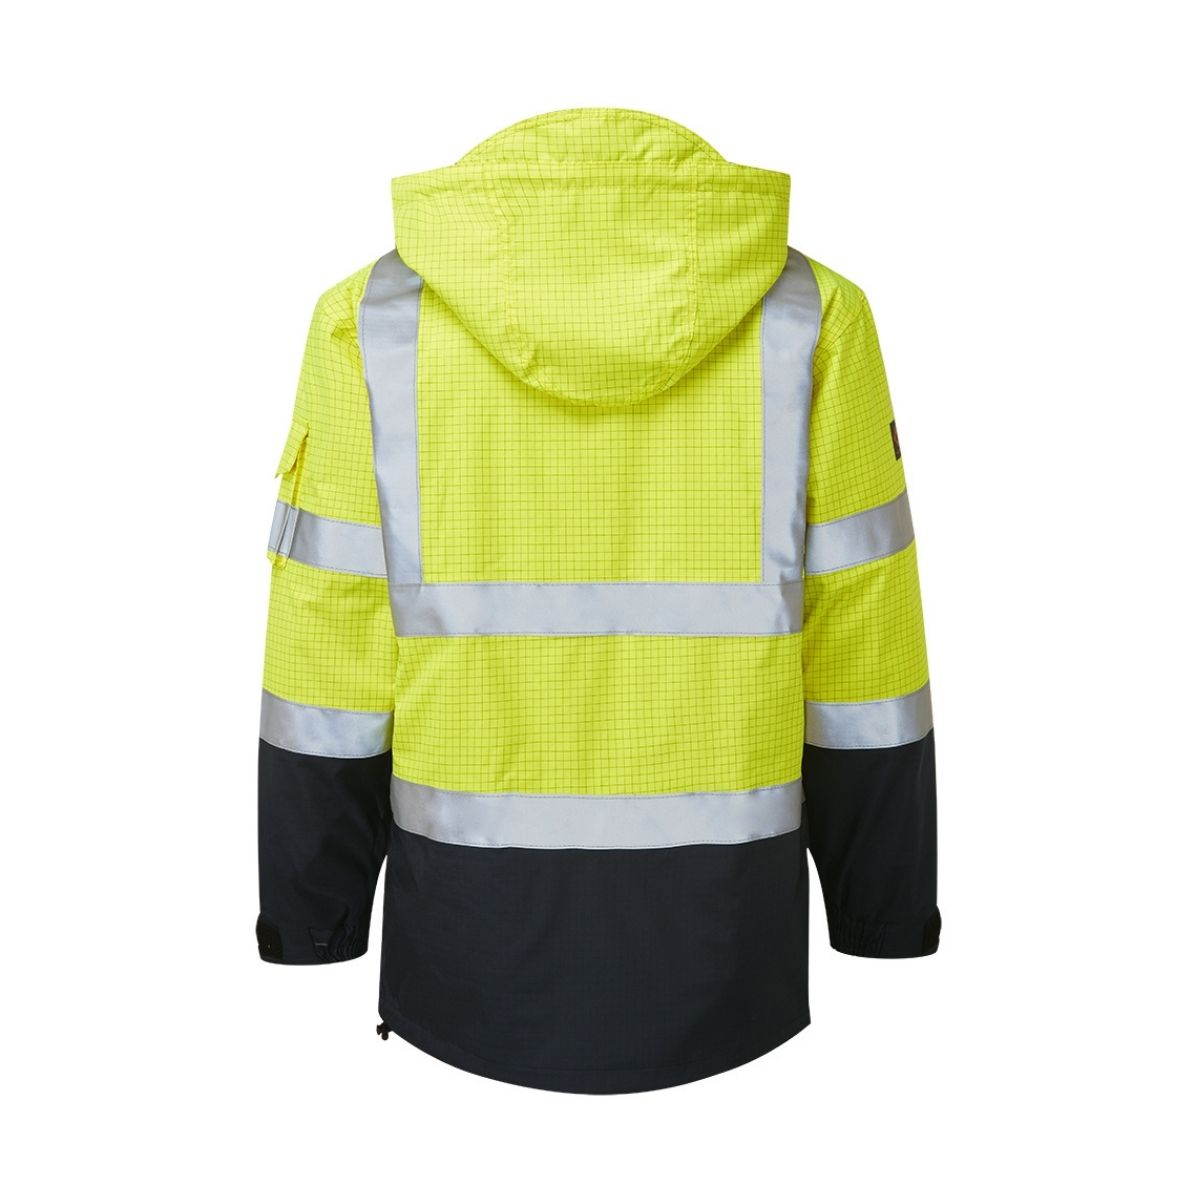 AS9464 HAZTEC® Boulton FR AS Hi-Visibility Waterproof Traffic Jacket - Yellow_Navy Back